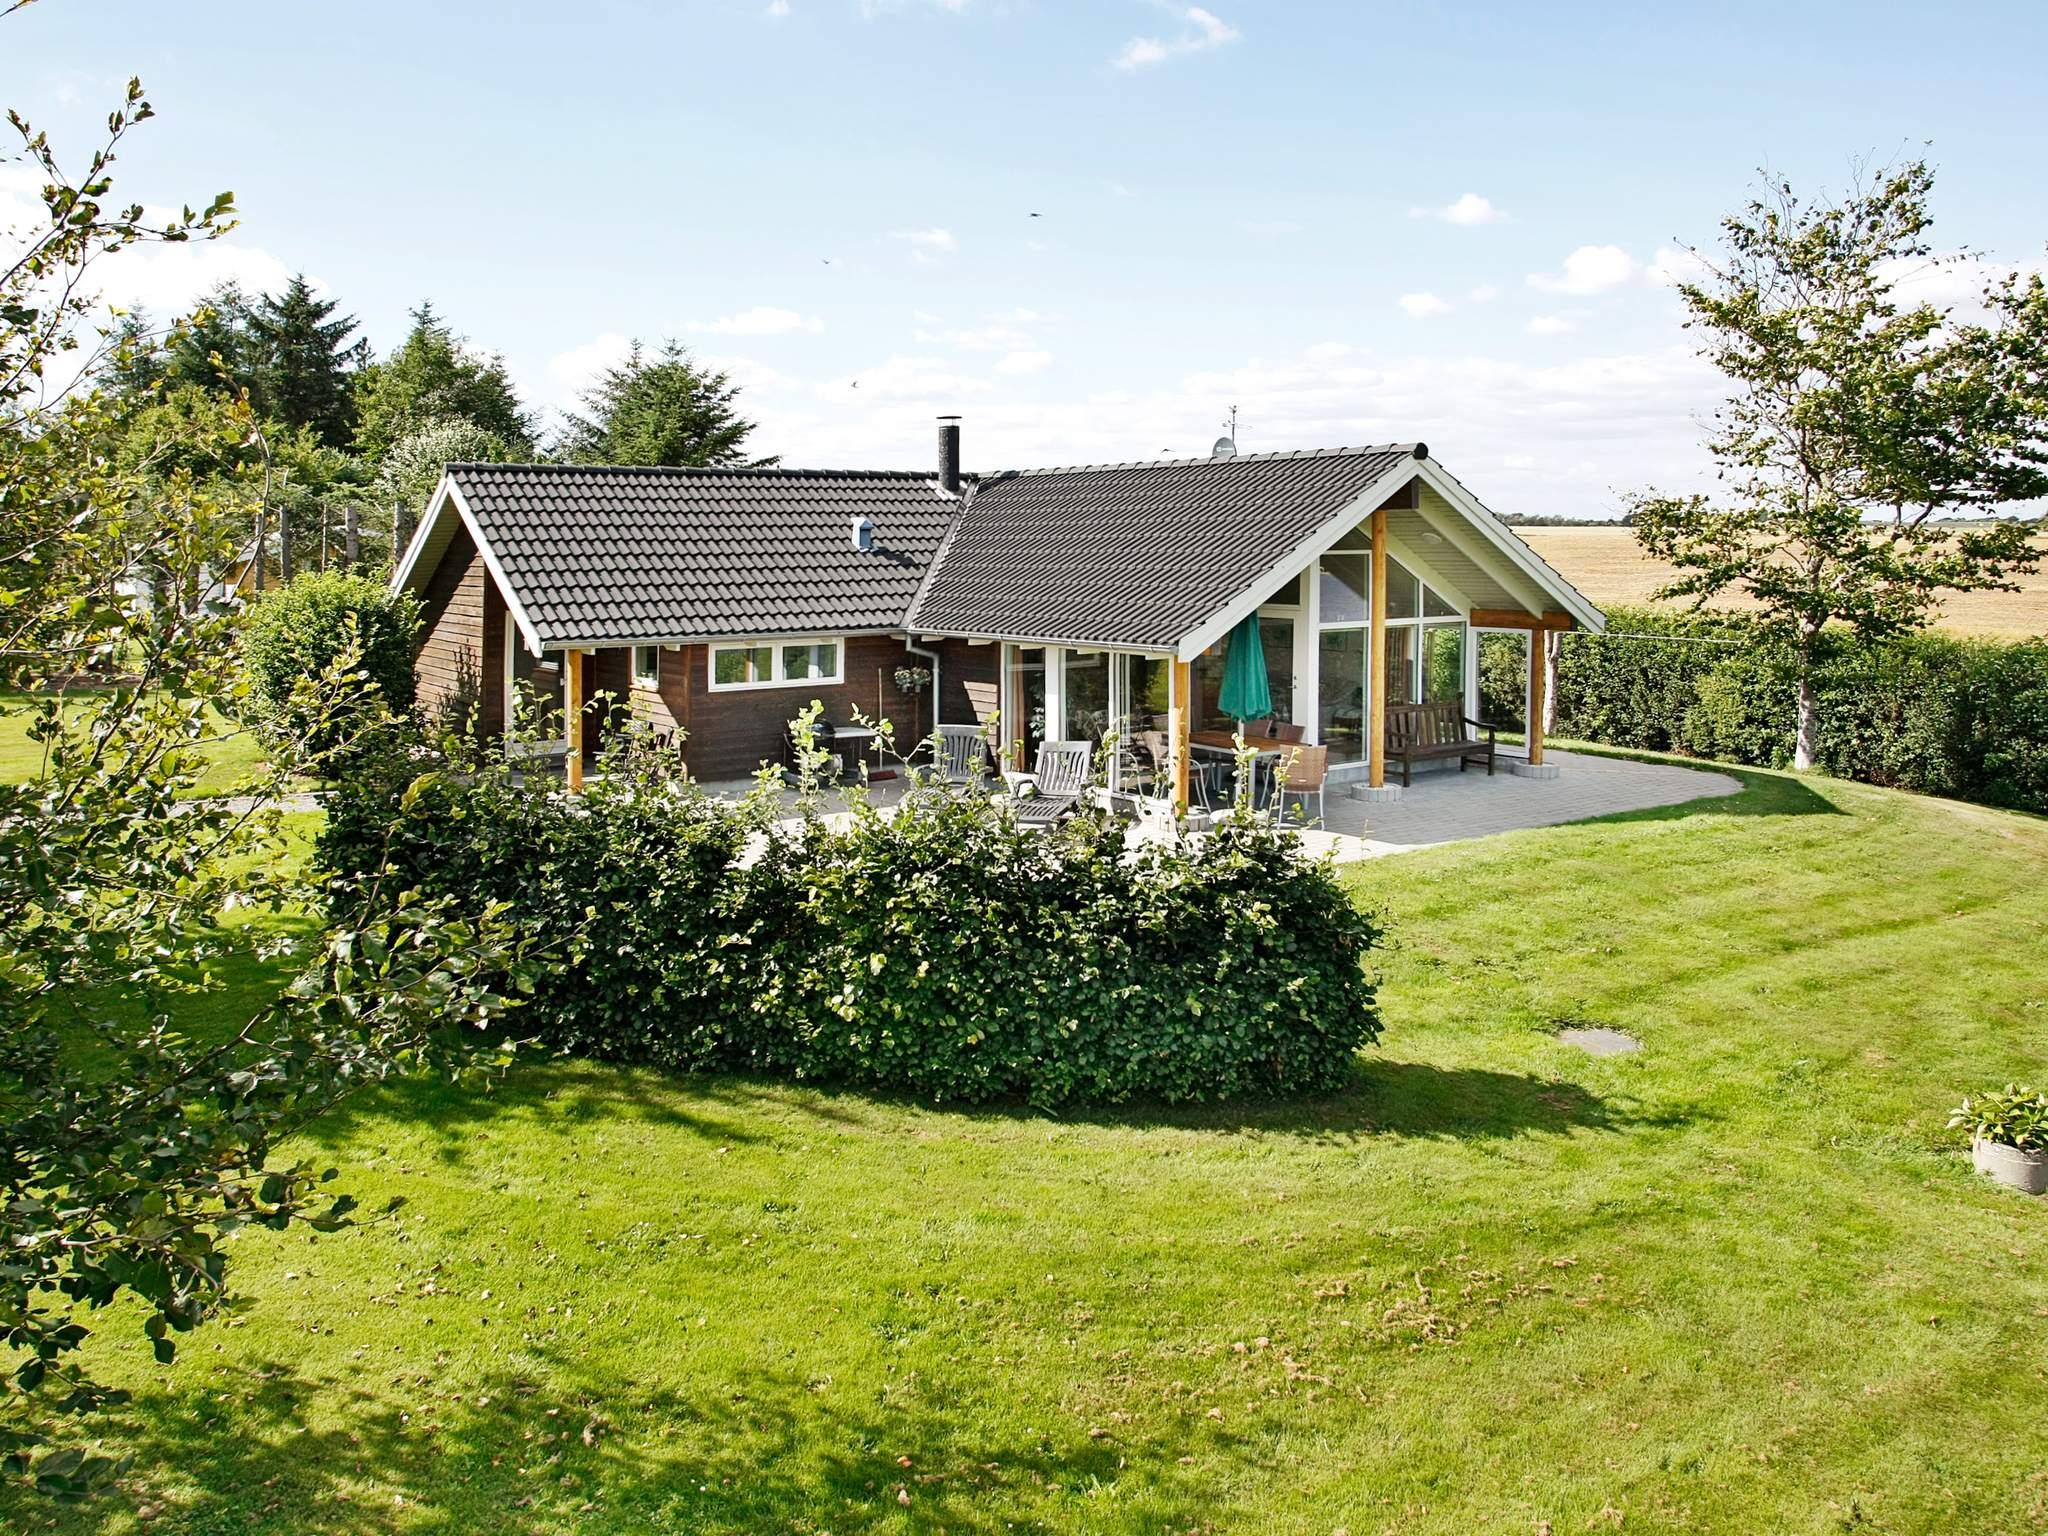 Maison de vacances Astrup Vig (407189), Roslev, , Limfjord, Danemark, image 12